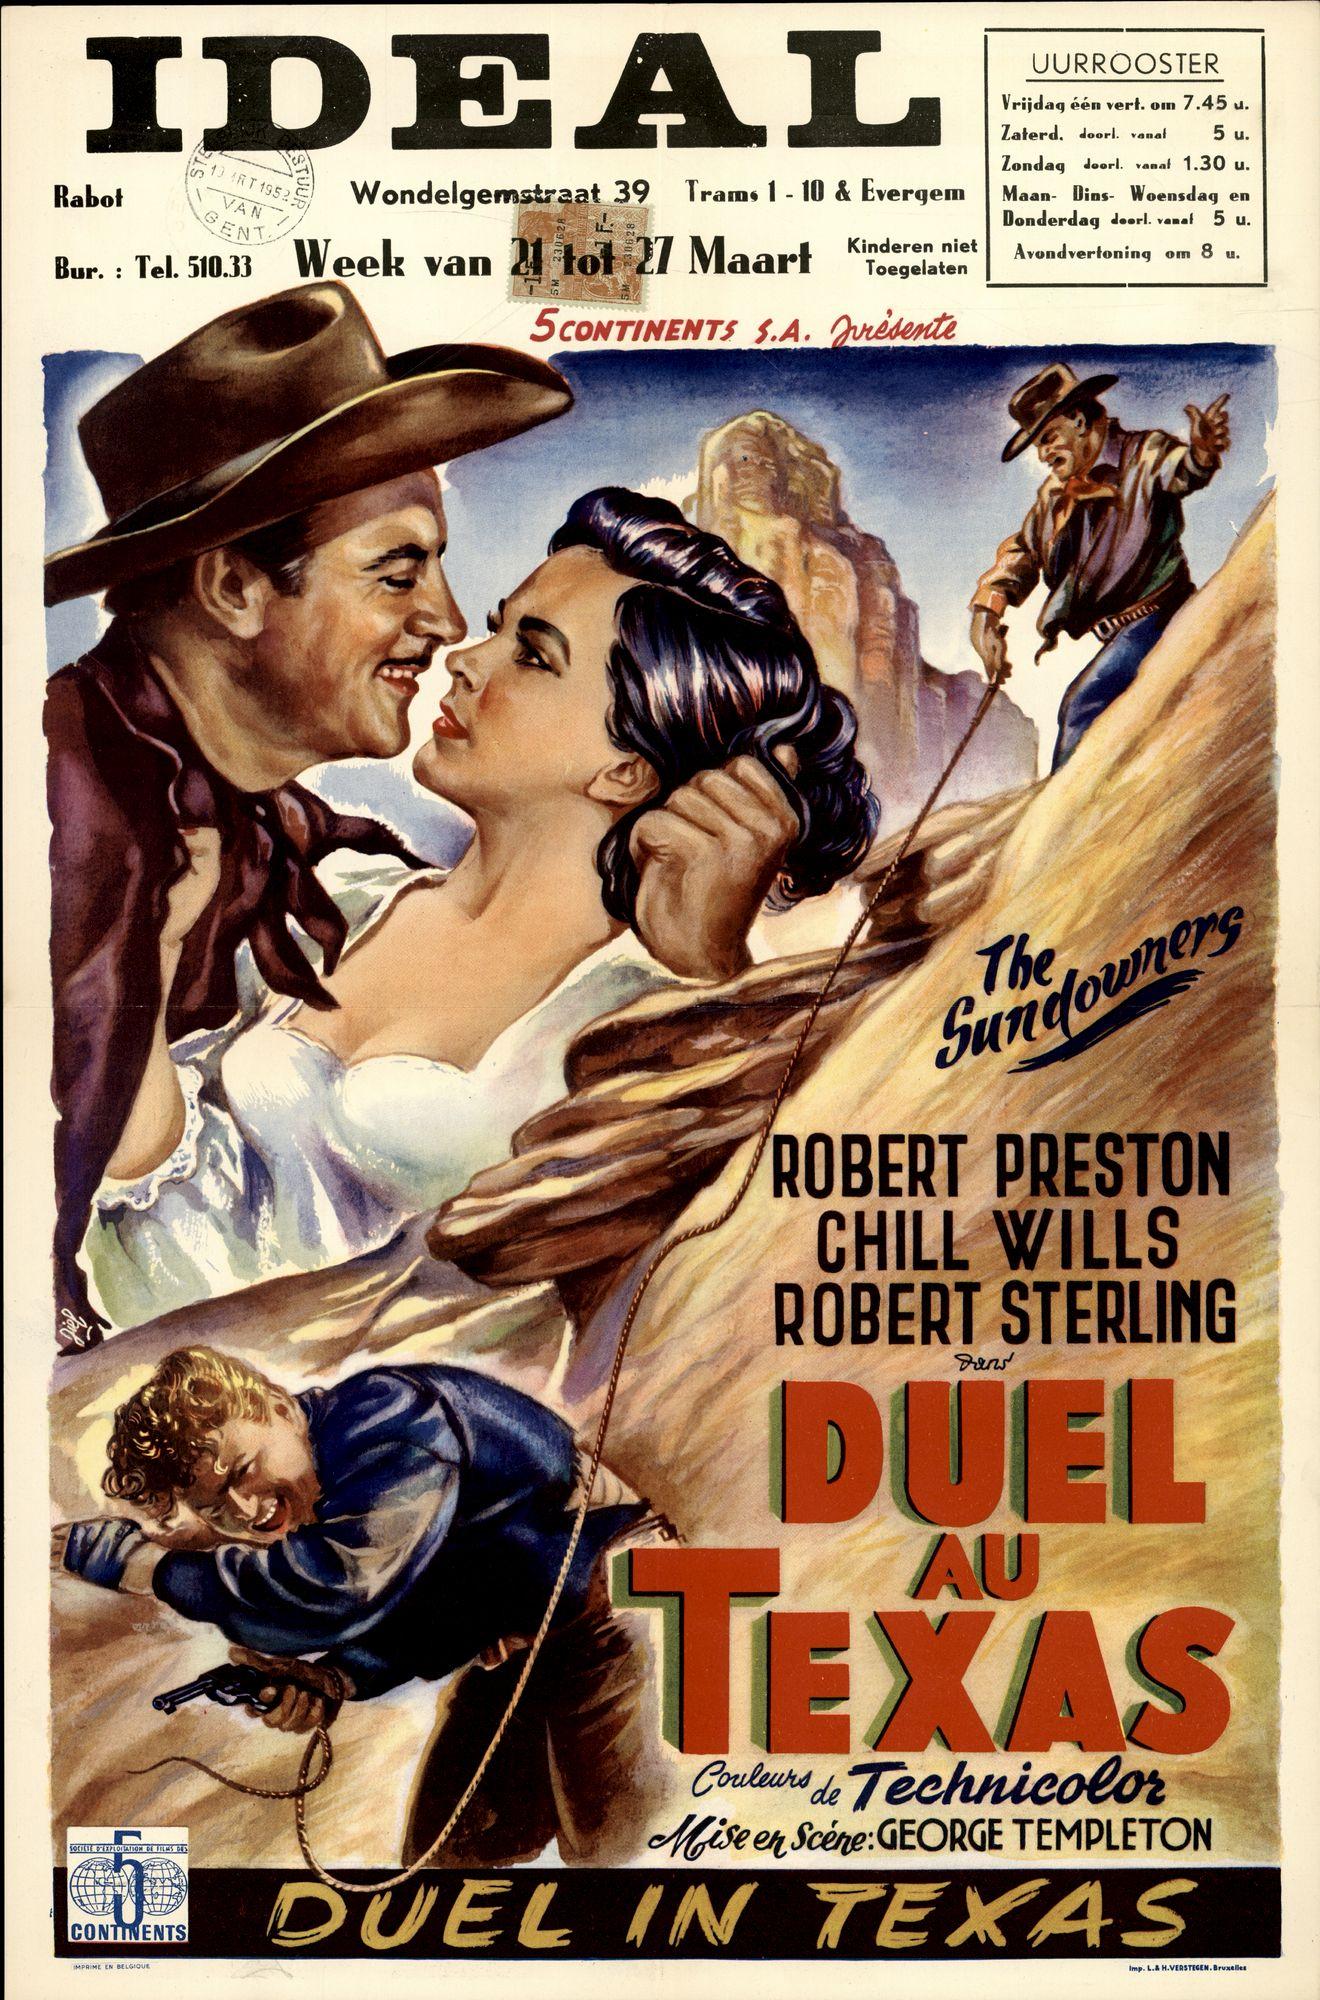 Duel au Texas | Duel in Texas | The Sundoxners, Ideal, Gent, 21 - 27 maart 1952